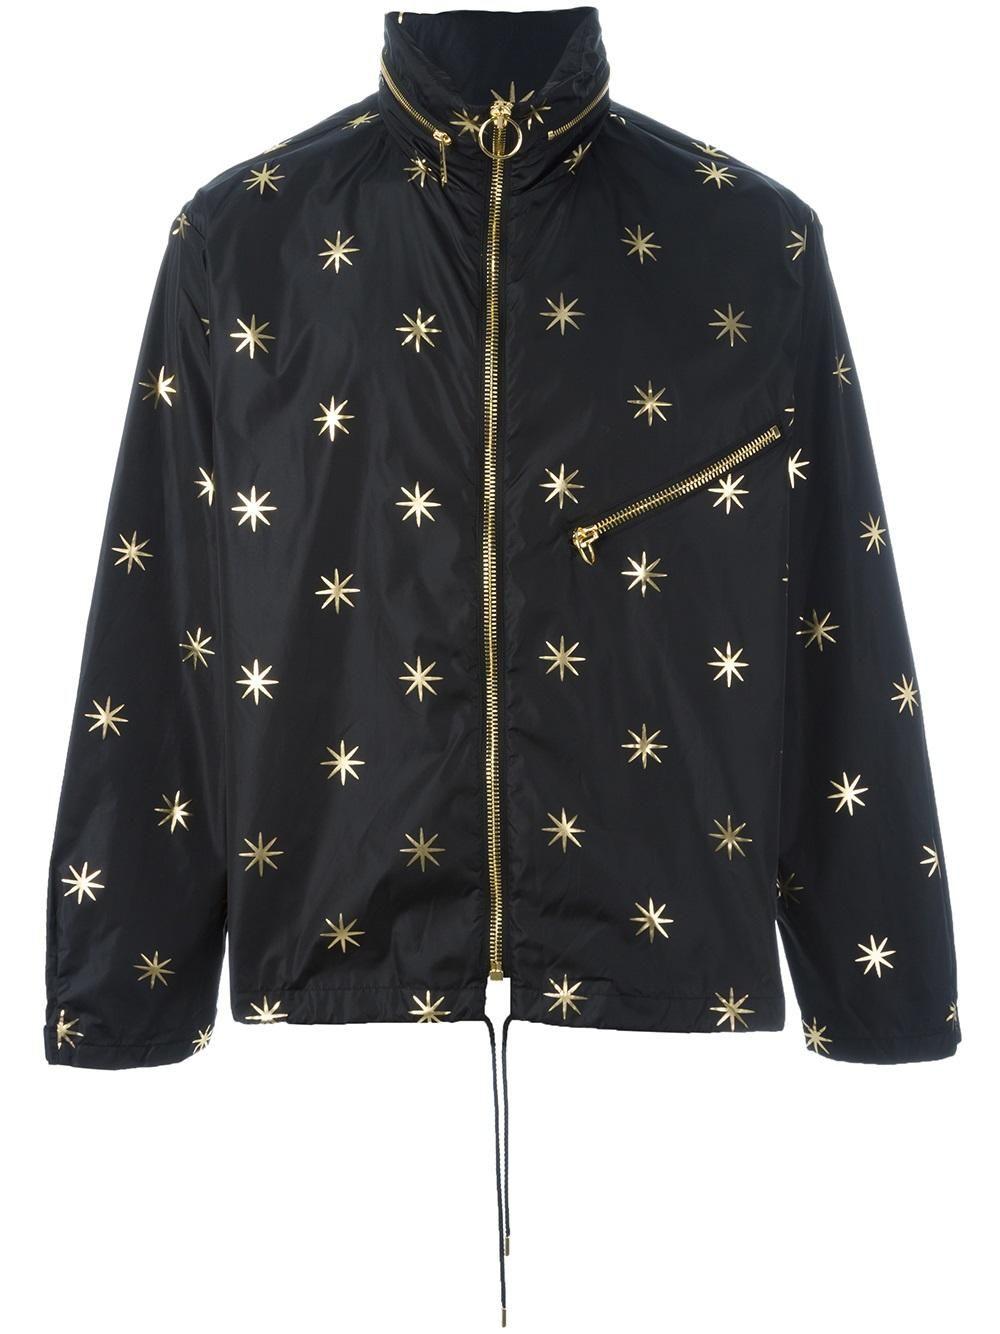 Palm Angels Stars Studded Jacket Studded Jacket Jackets Mens Lightweight Jacket [ 1334 x 1000 Pixel ]